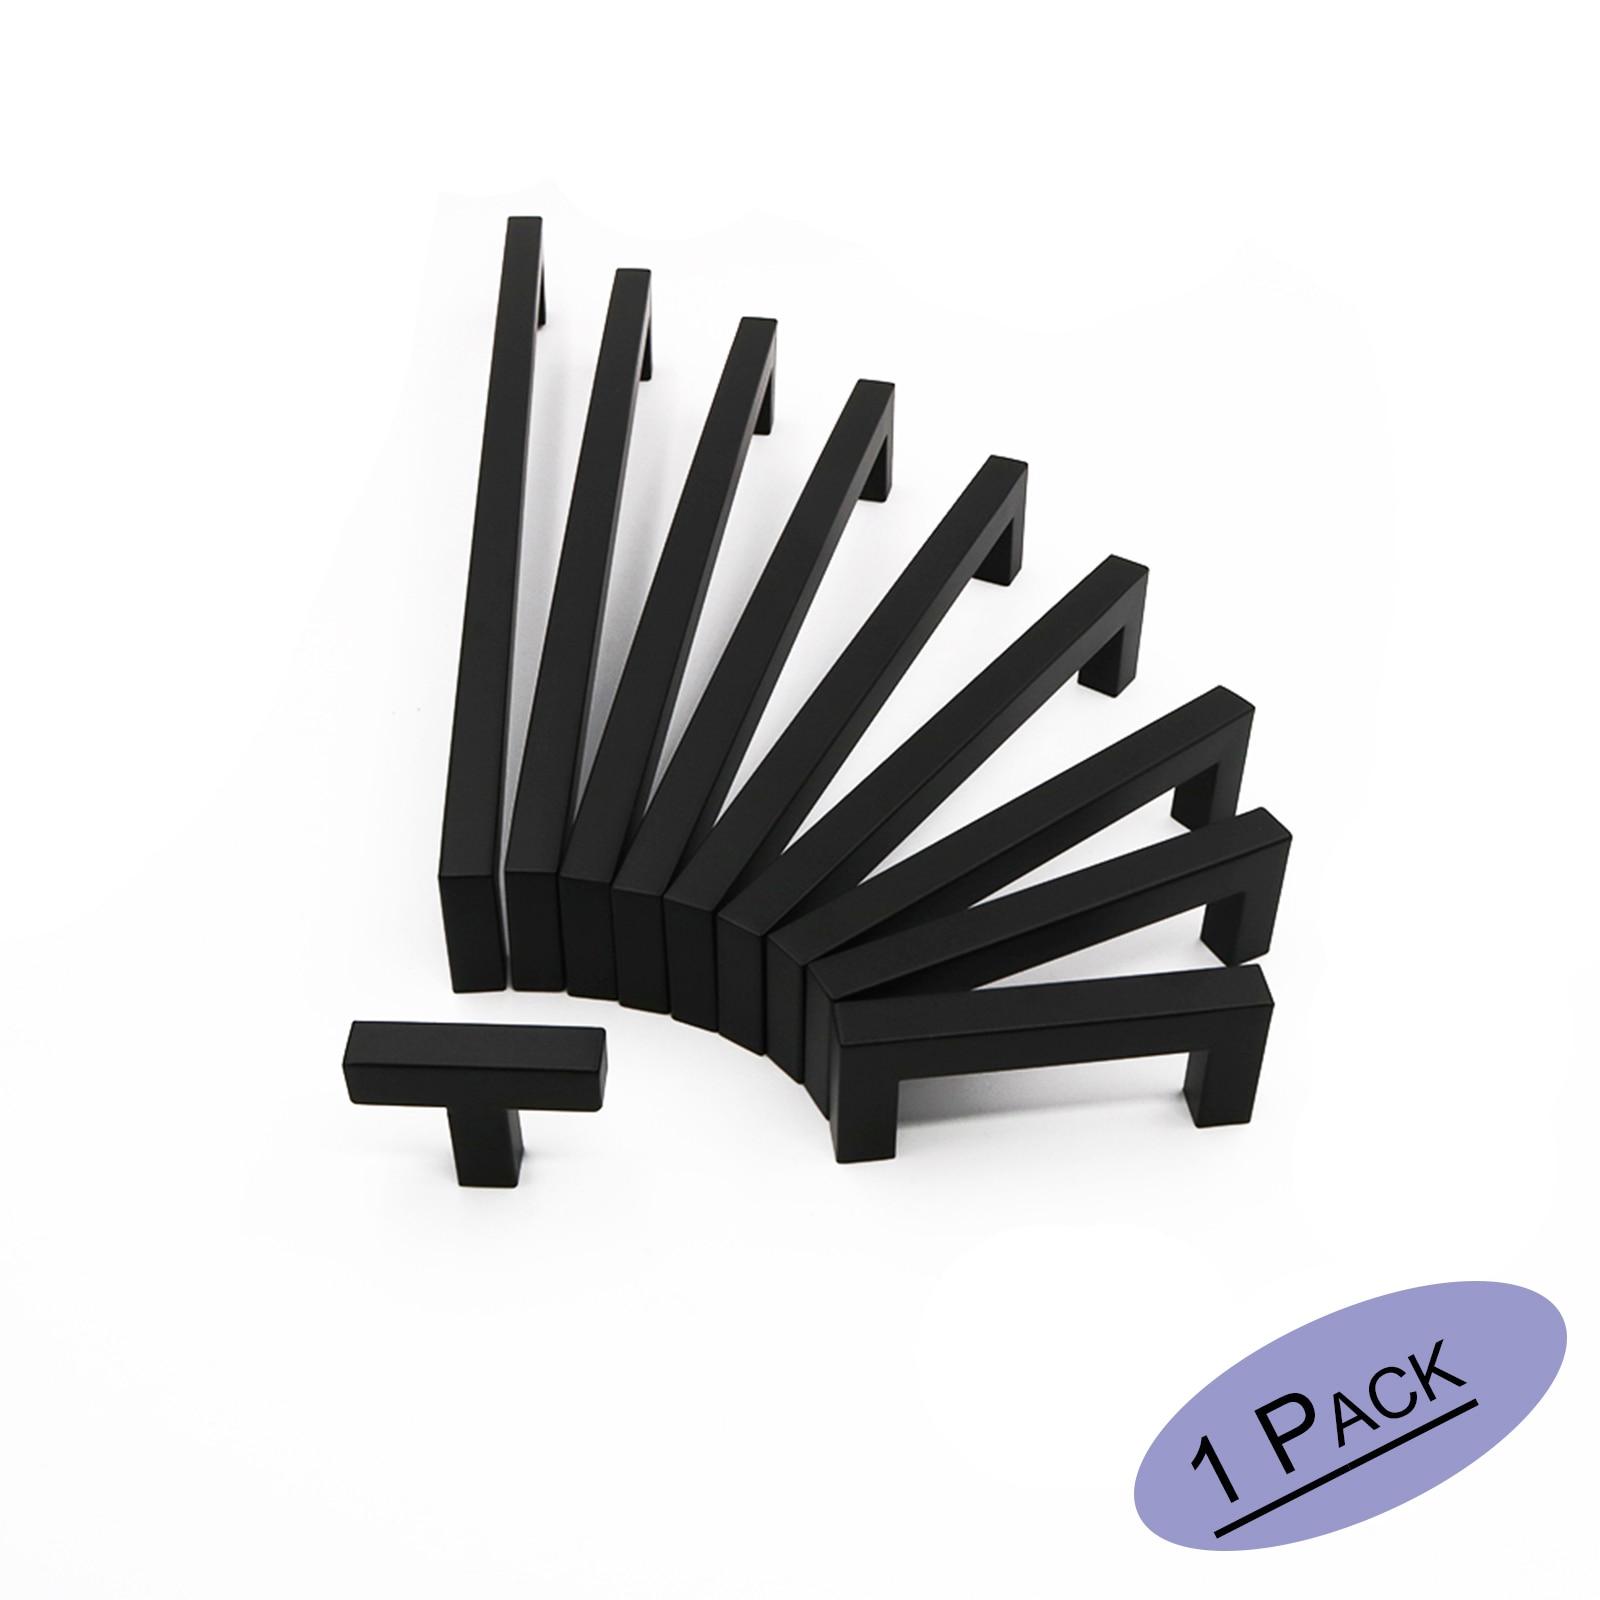 Black Cabinet Handle Stainless Steel Hi12mm*12mm Square Bar Cupboard Pull Kitchen CLoset Drawer Door Knob 3.75